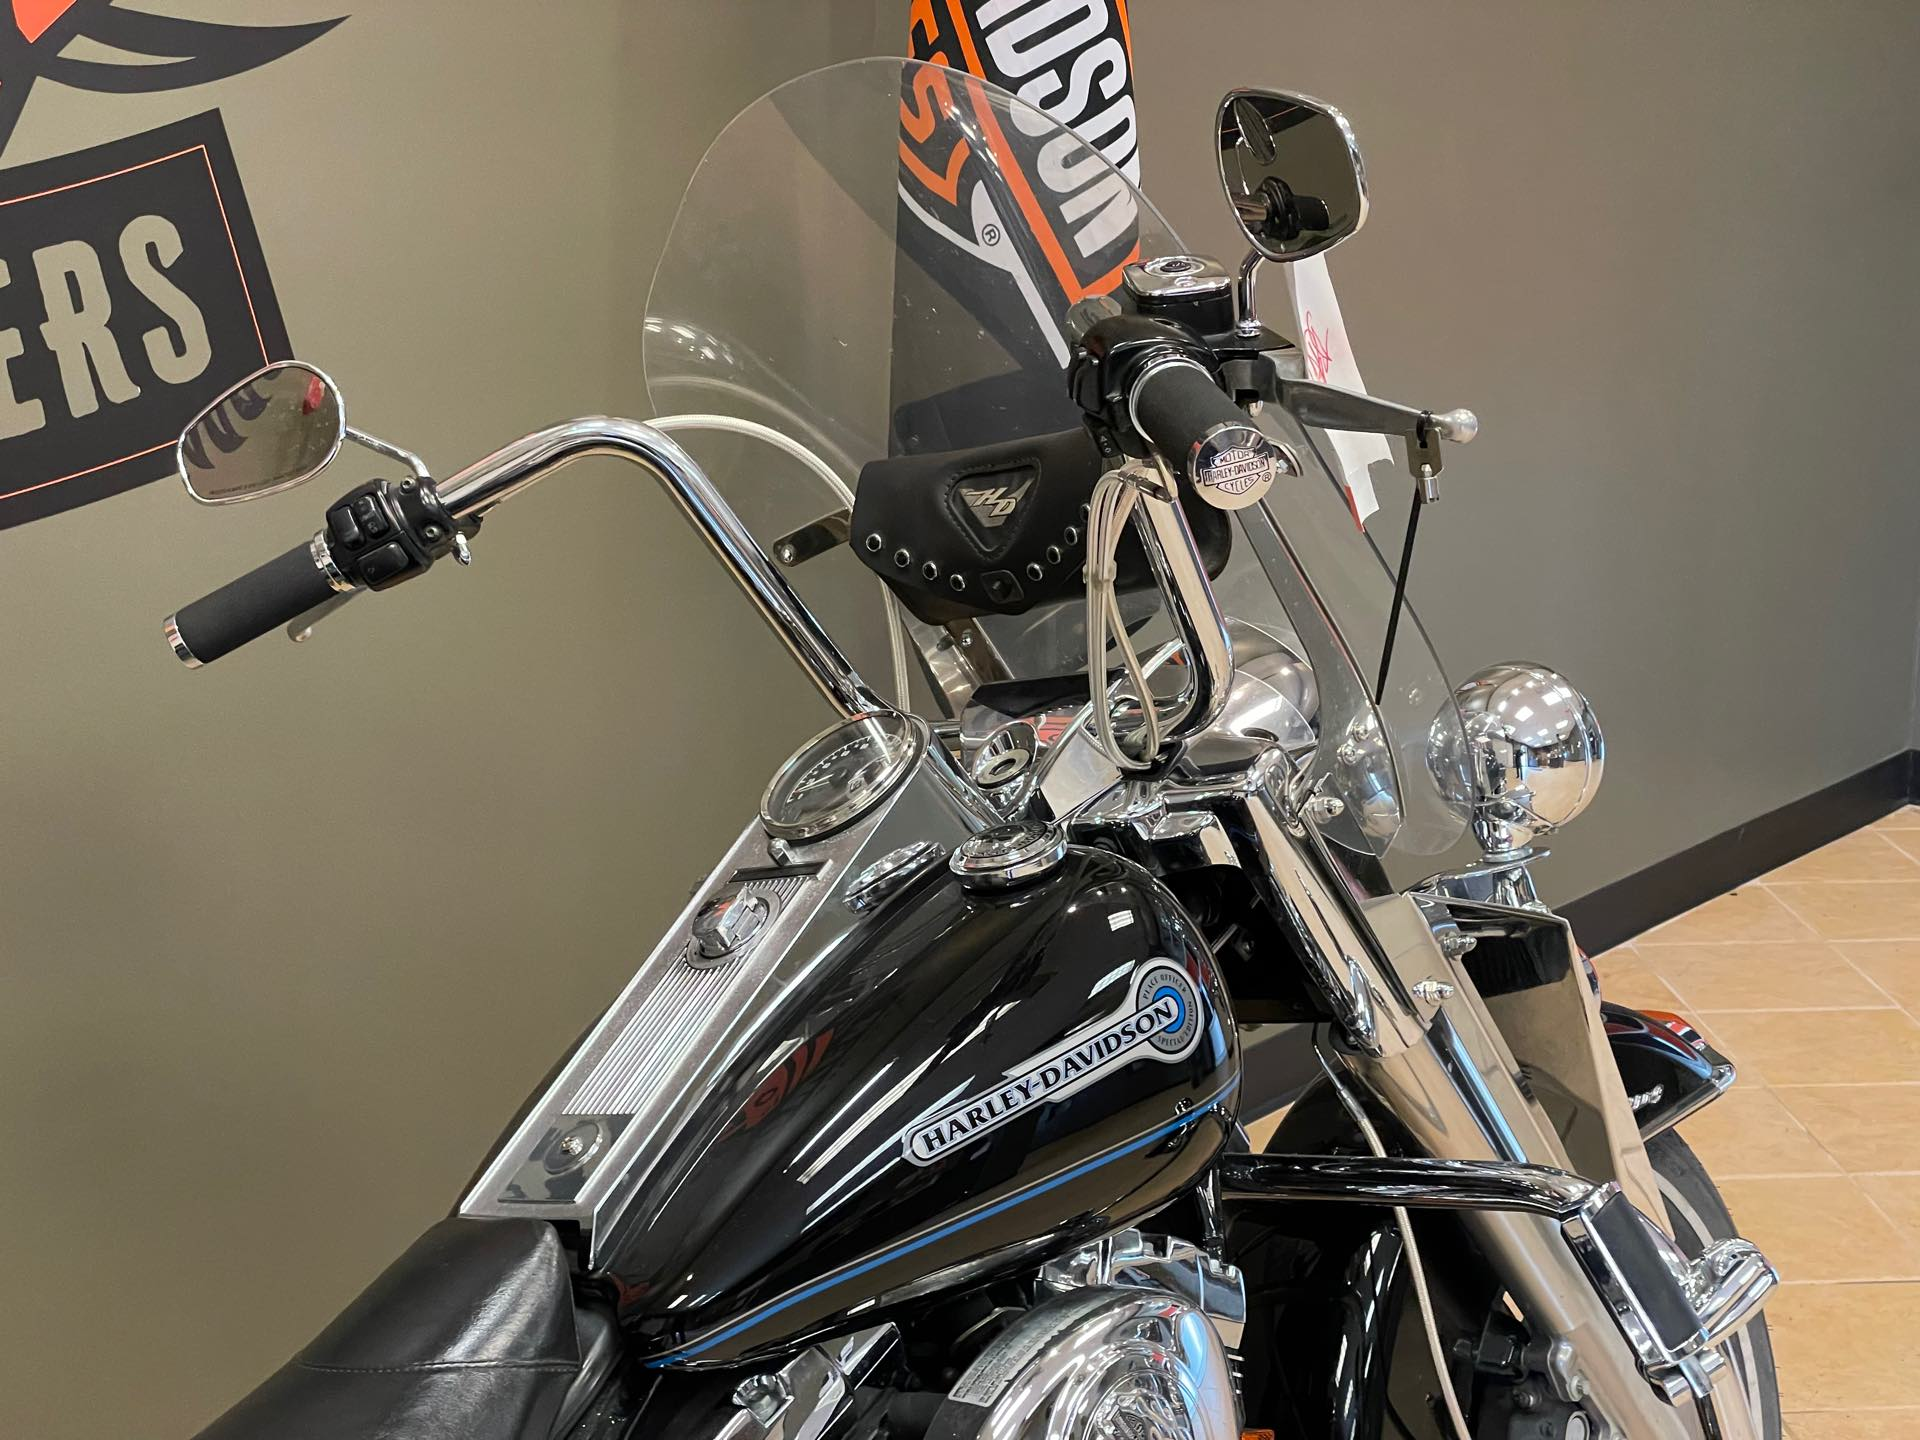 2006 HARLEY-DAVIDSON FLHRI at Loess Hills Harley-Davidson